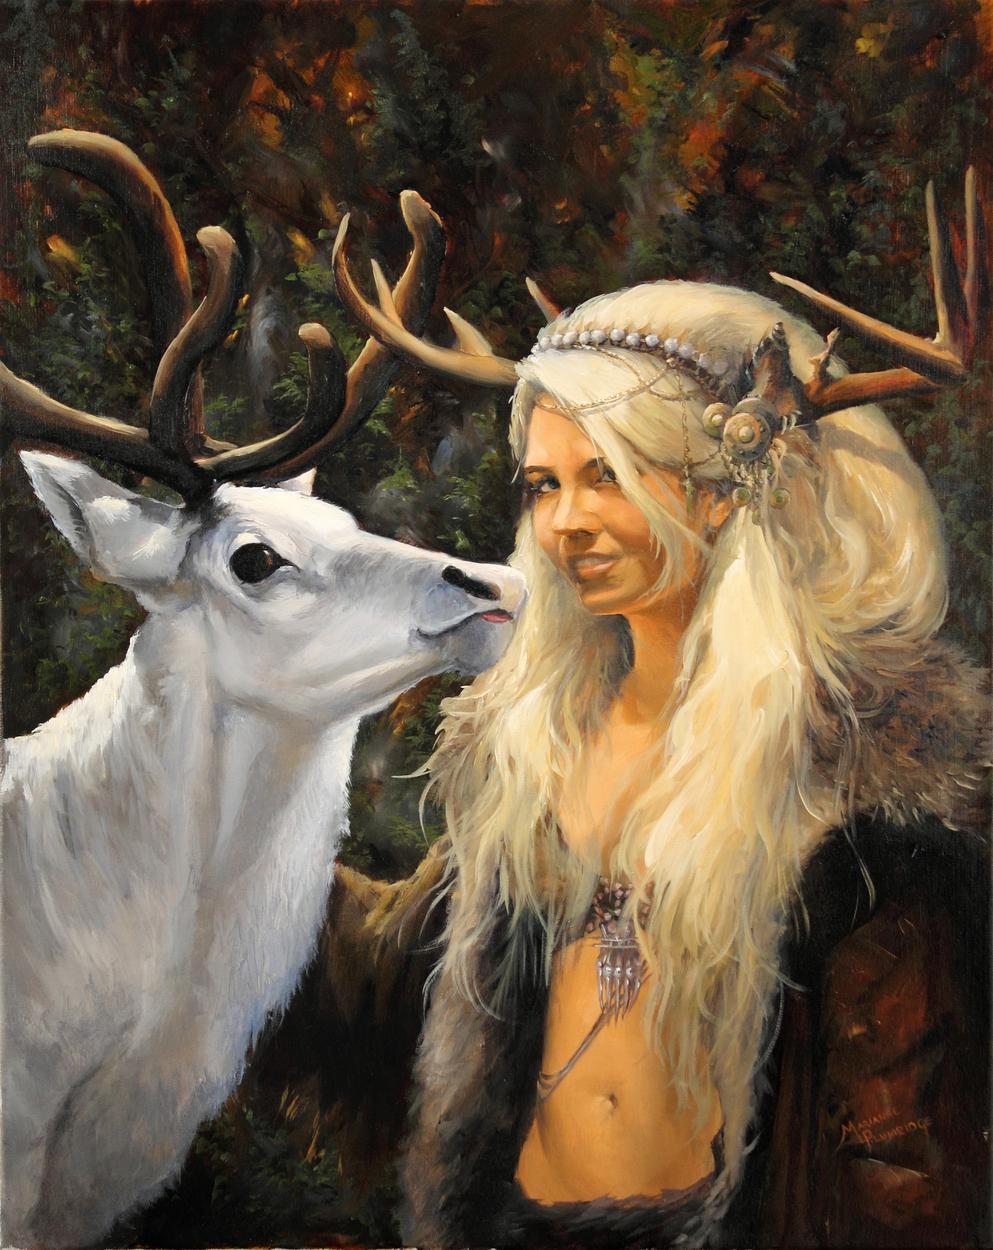 KINDRED SPIRITS Artwork by Marianne Plumridge